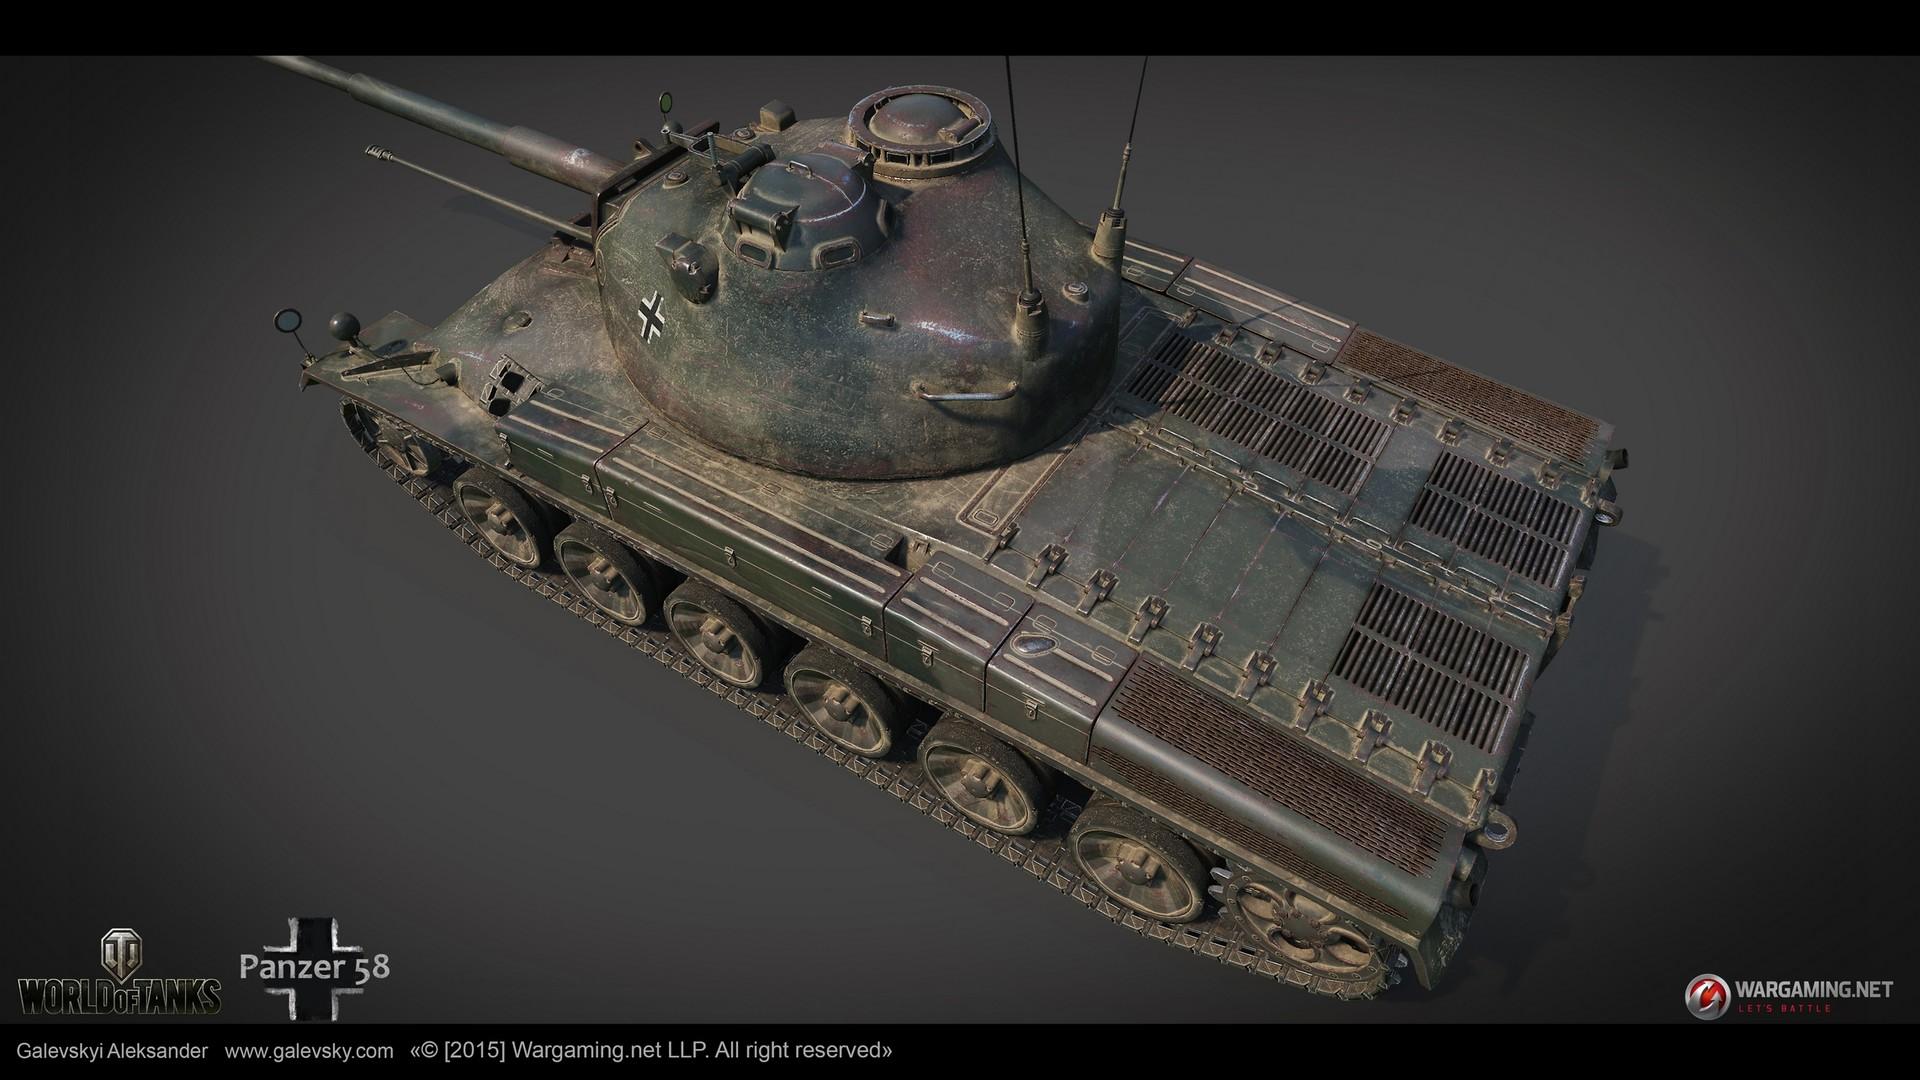 Aleksander galevskyi panzer 58 12 med